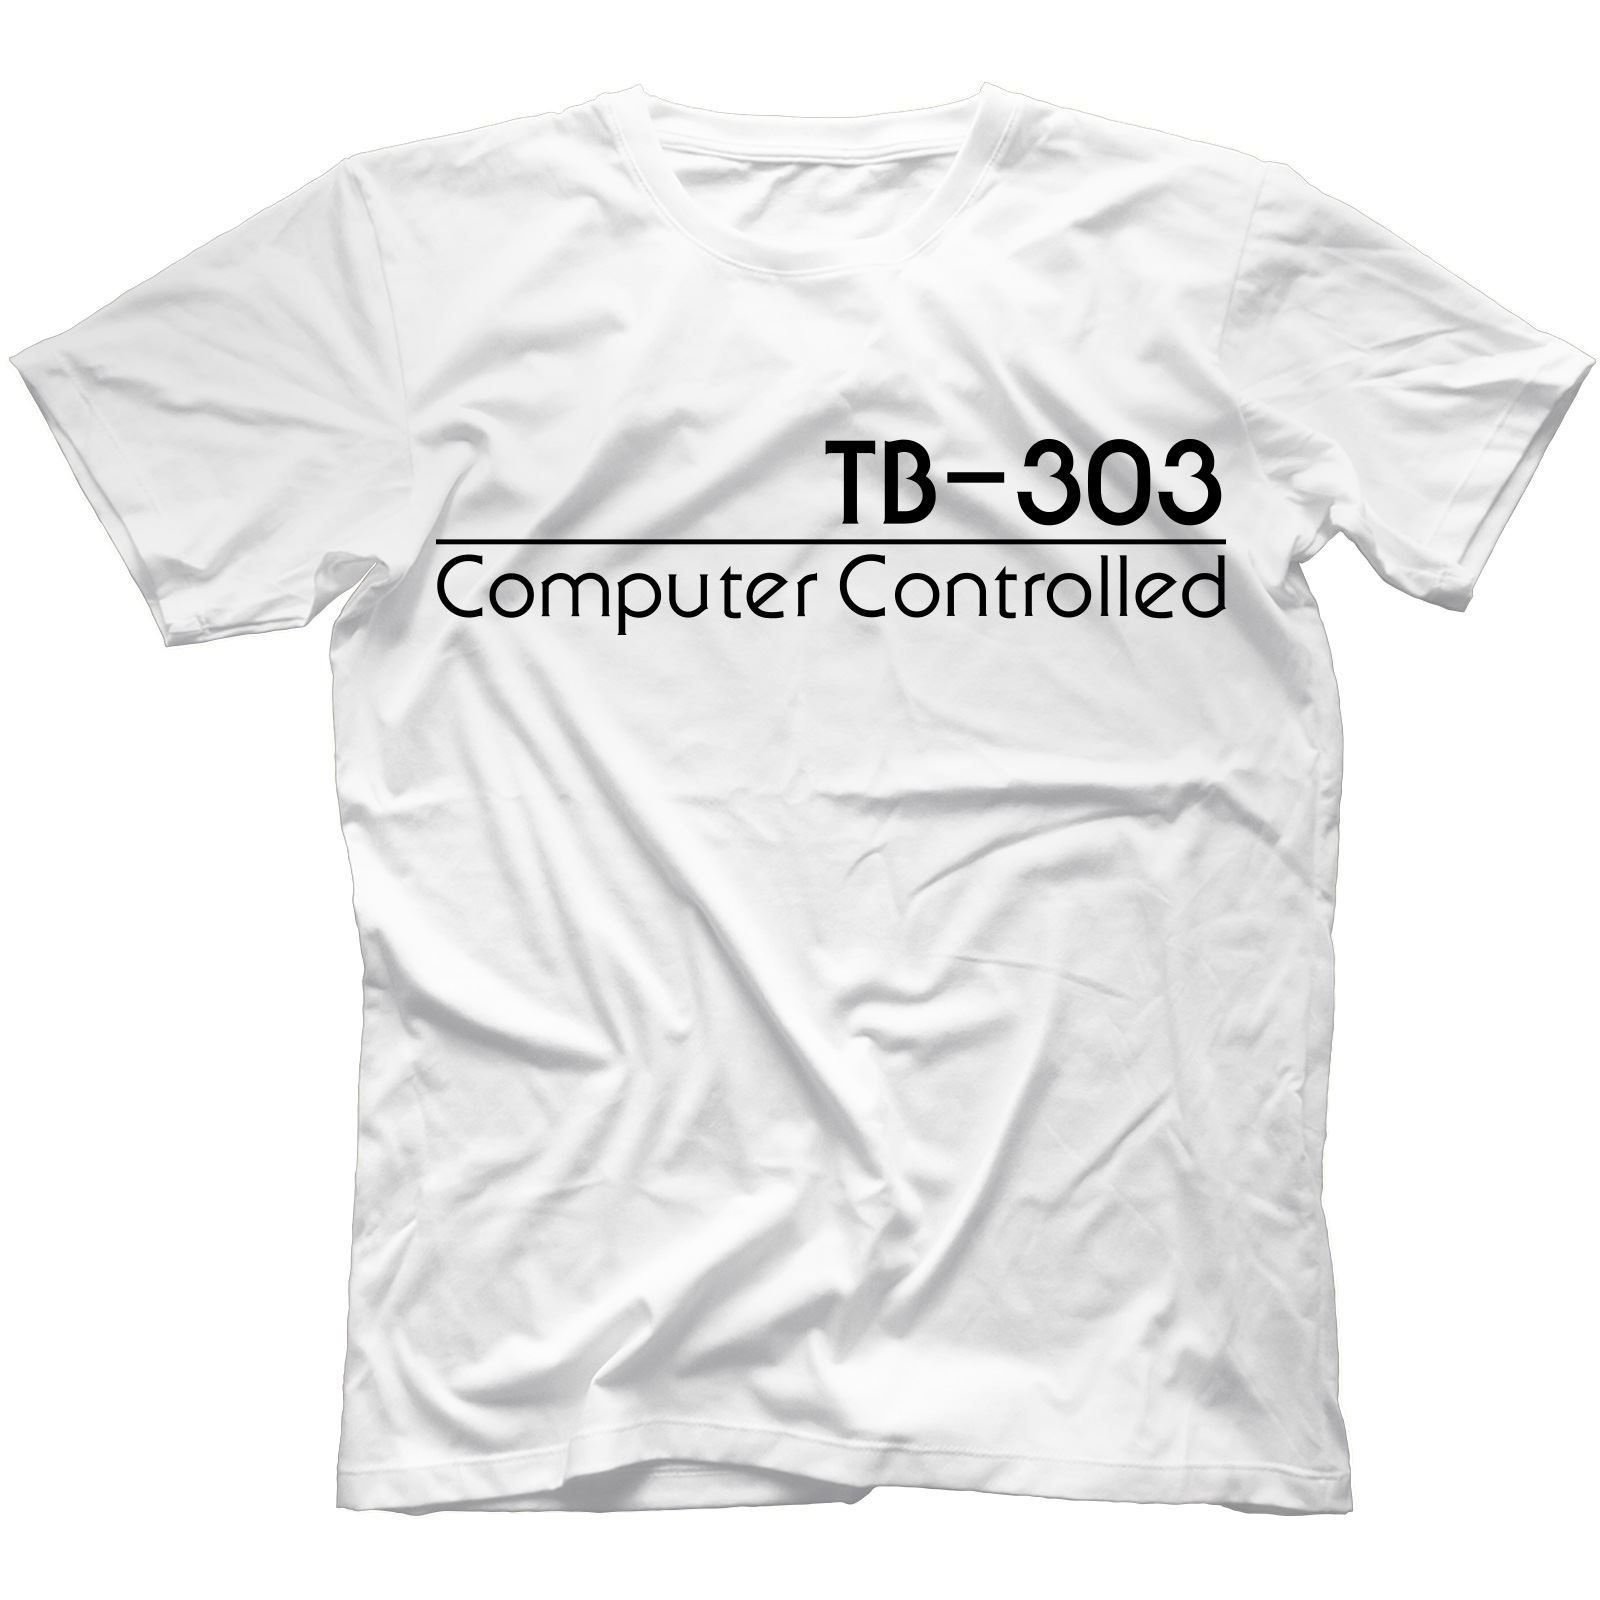 TB-303 T-Shirt 100/% Cotton Synthesiser Acid Analog Retro 808 909